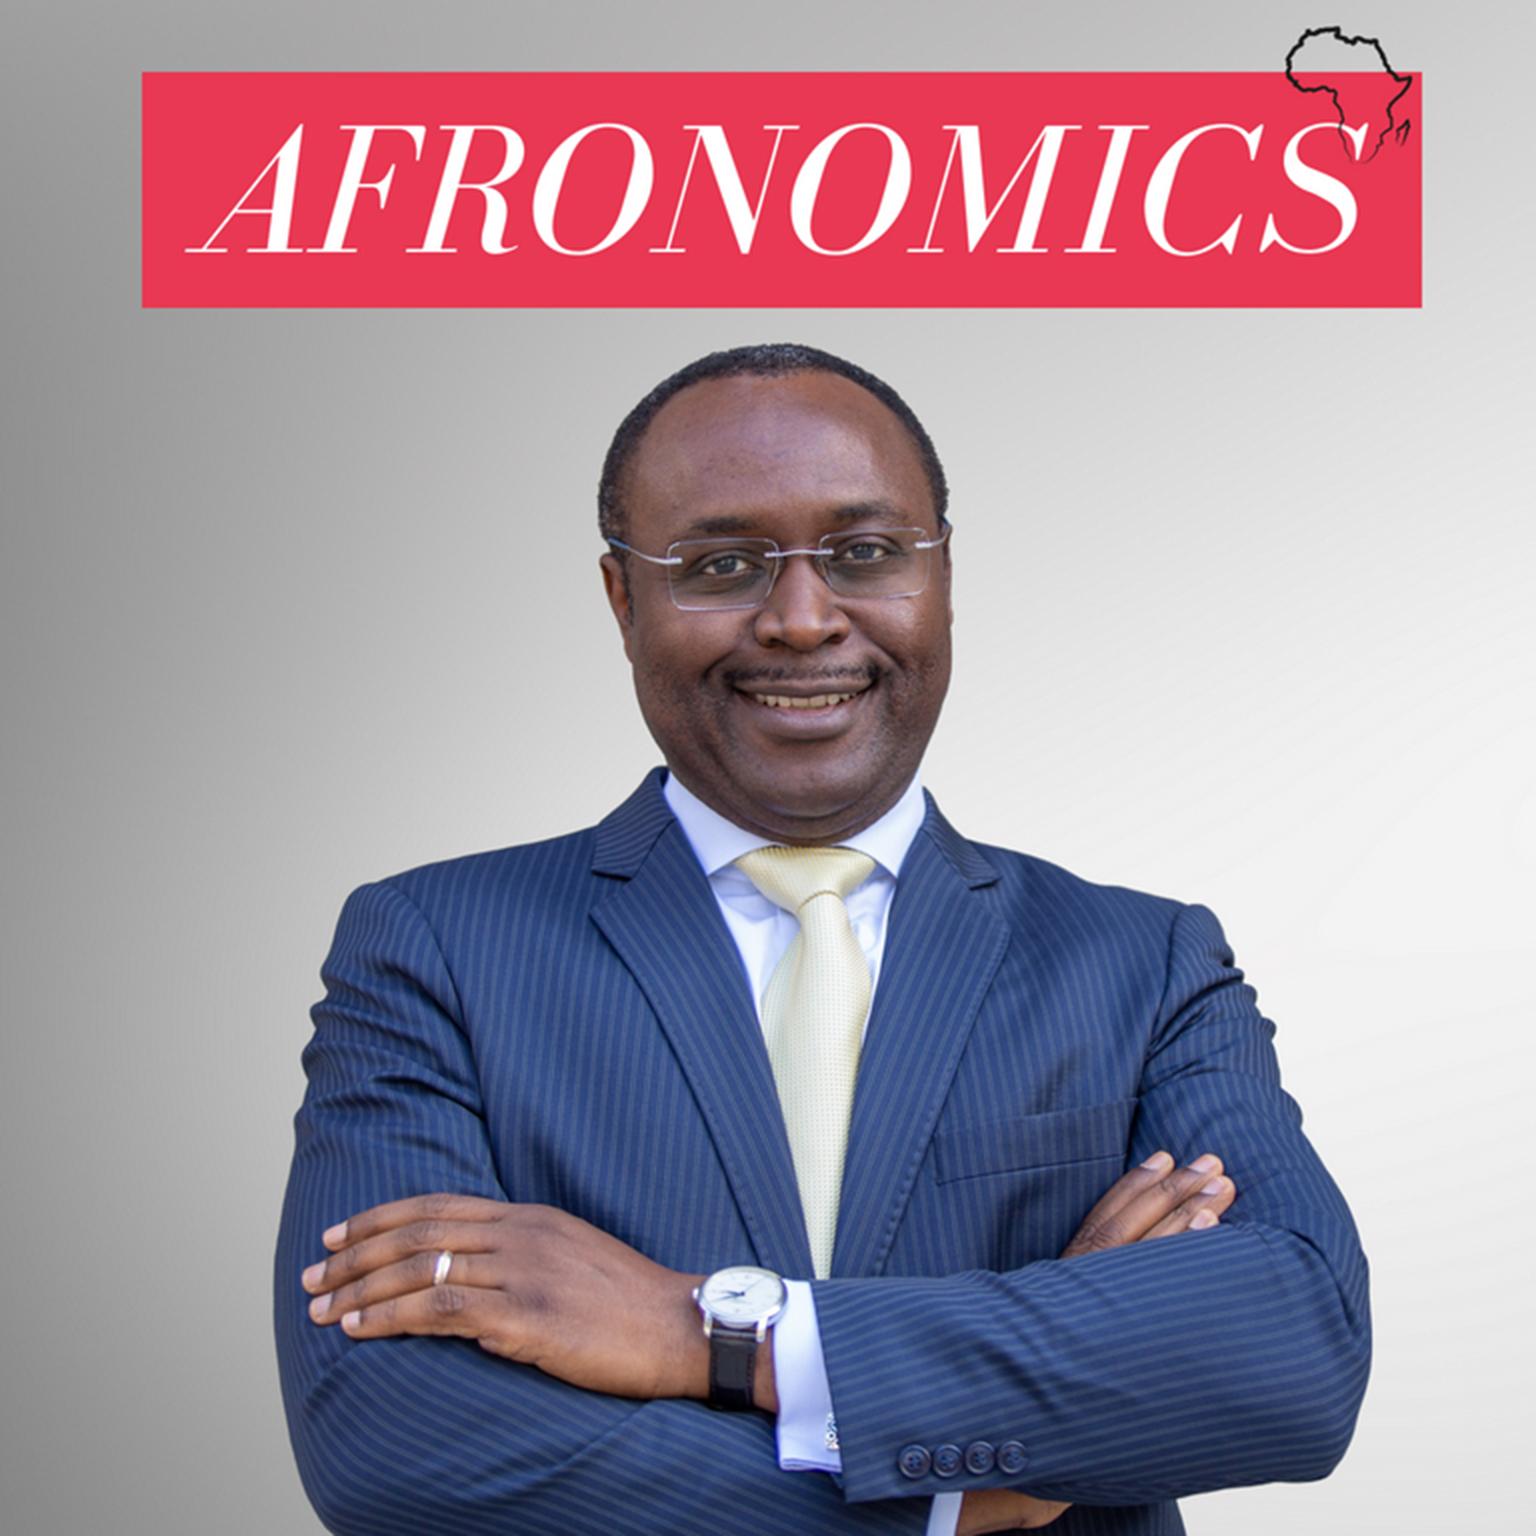 Artwork for podcast Afronomics